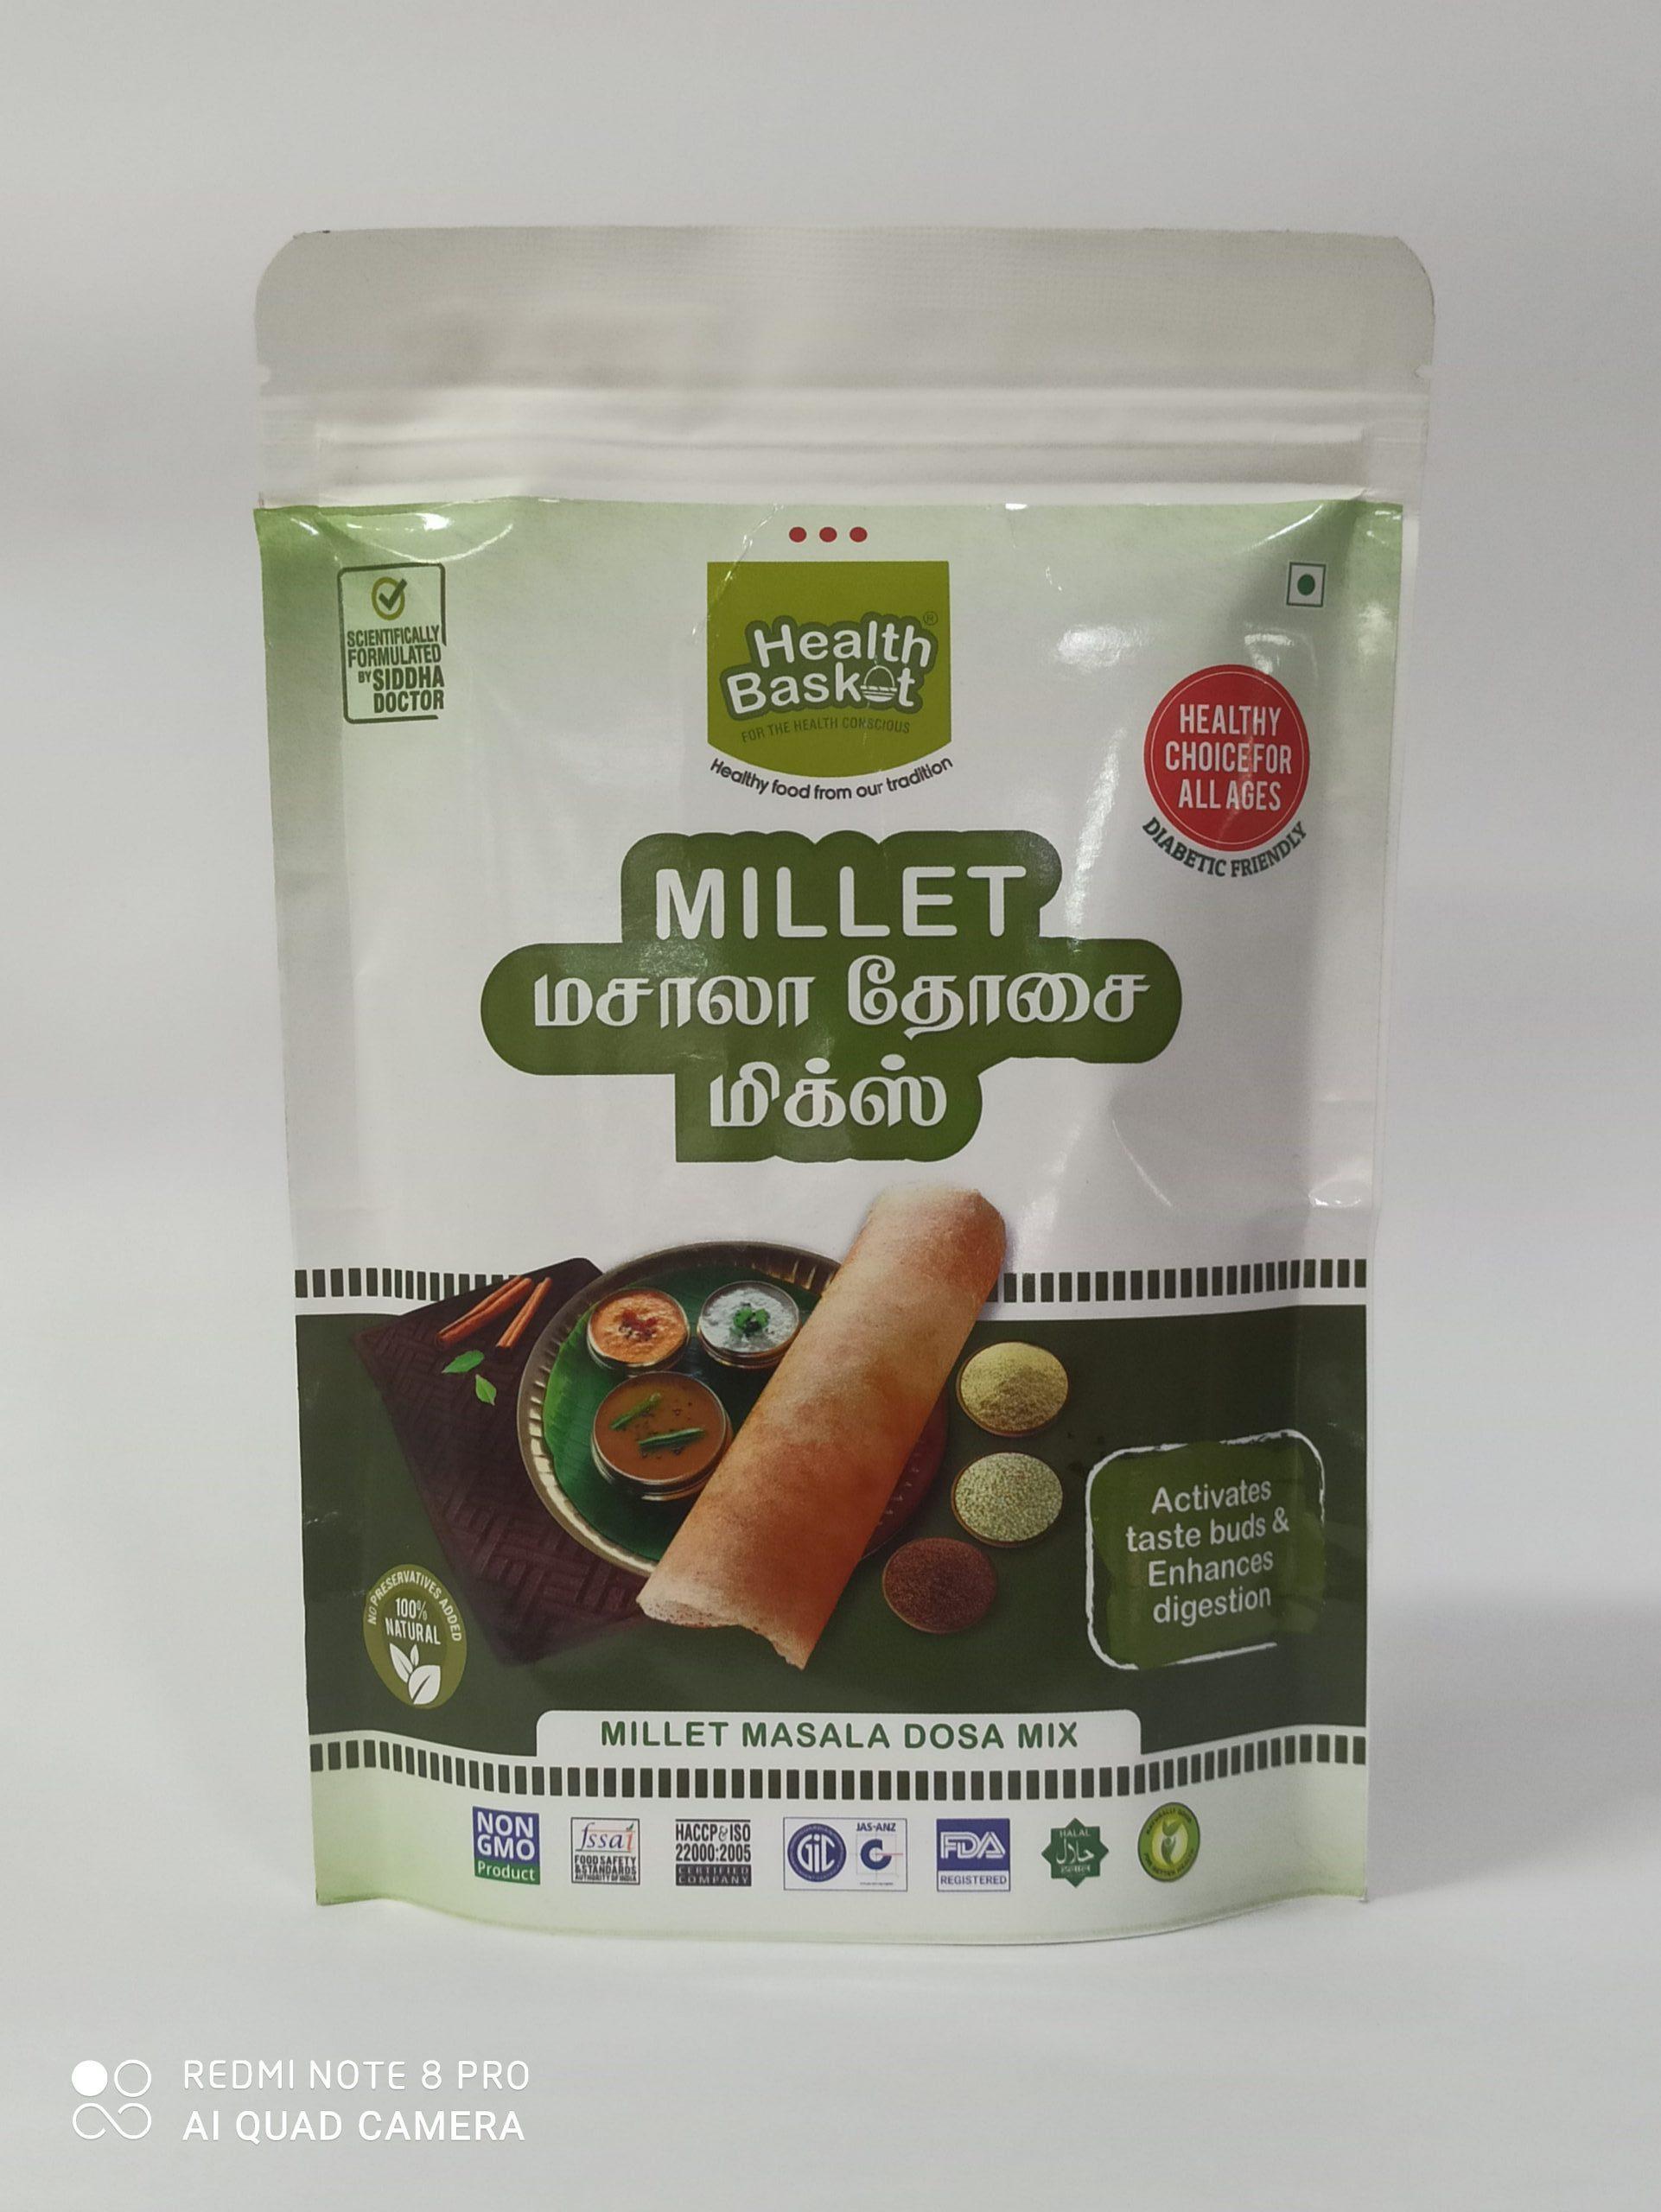 HEALTH BASKET MILLET MASALA DOSA MIX 300GM